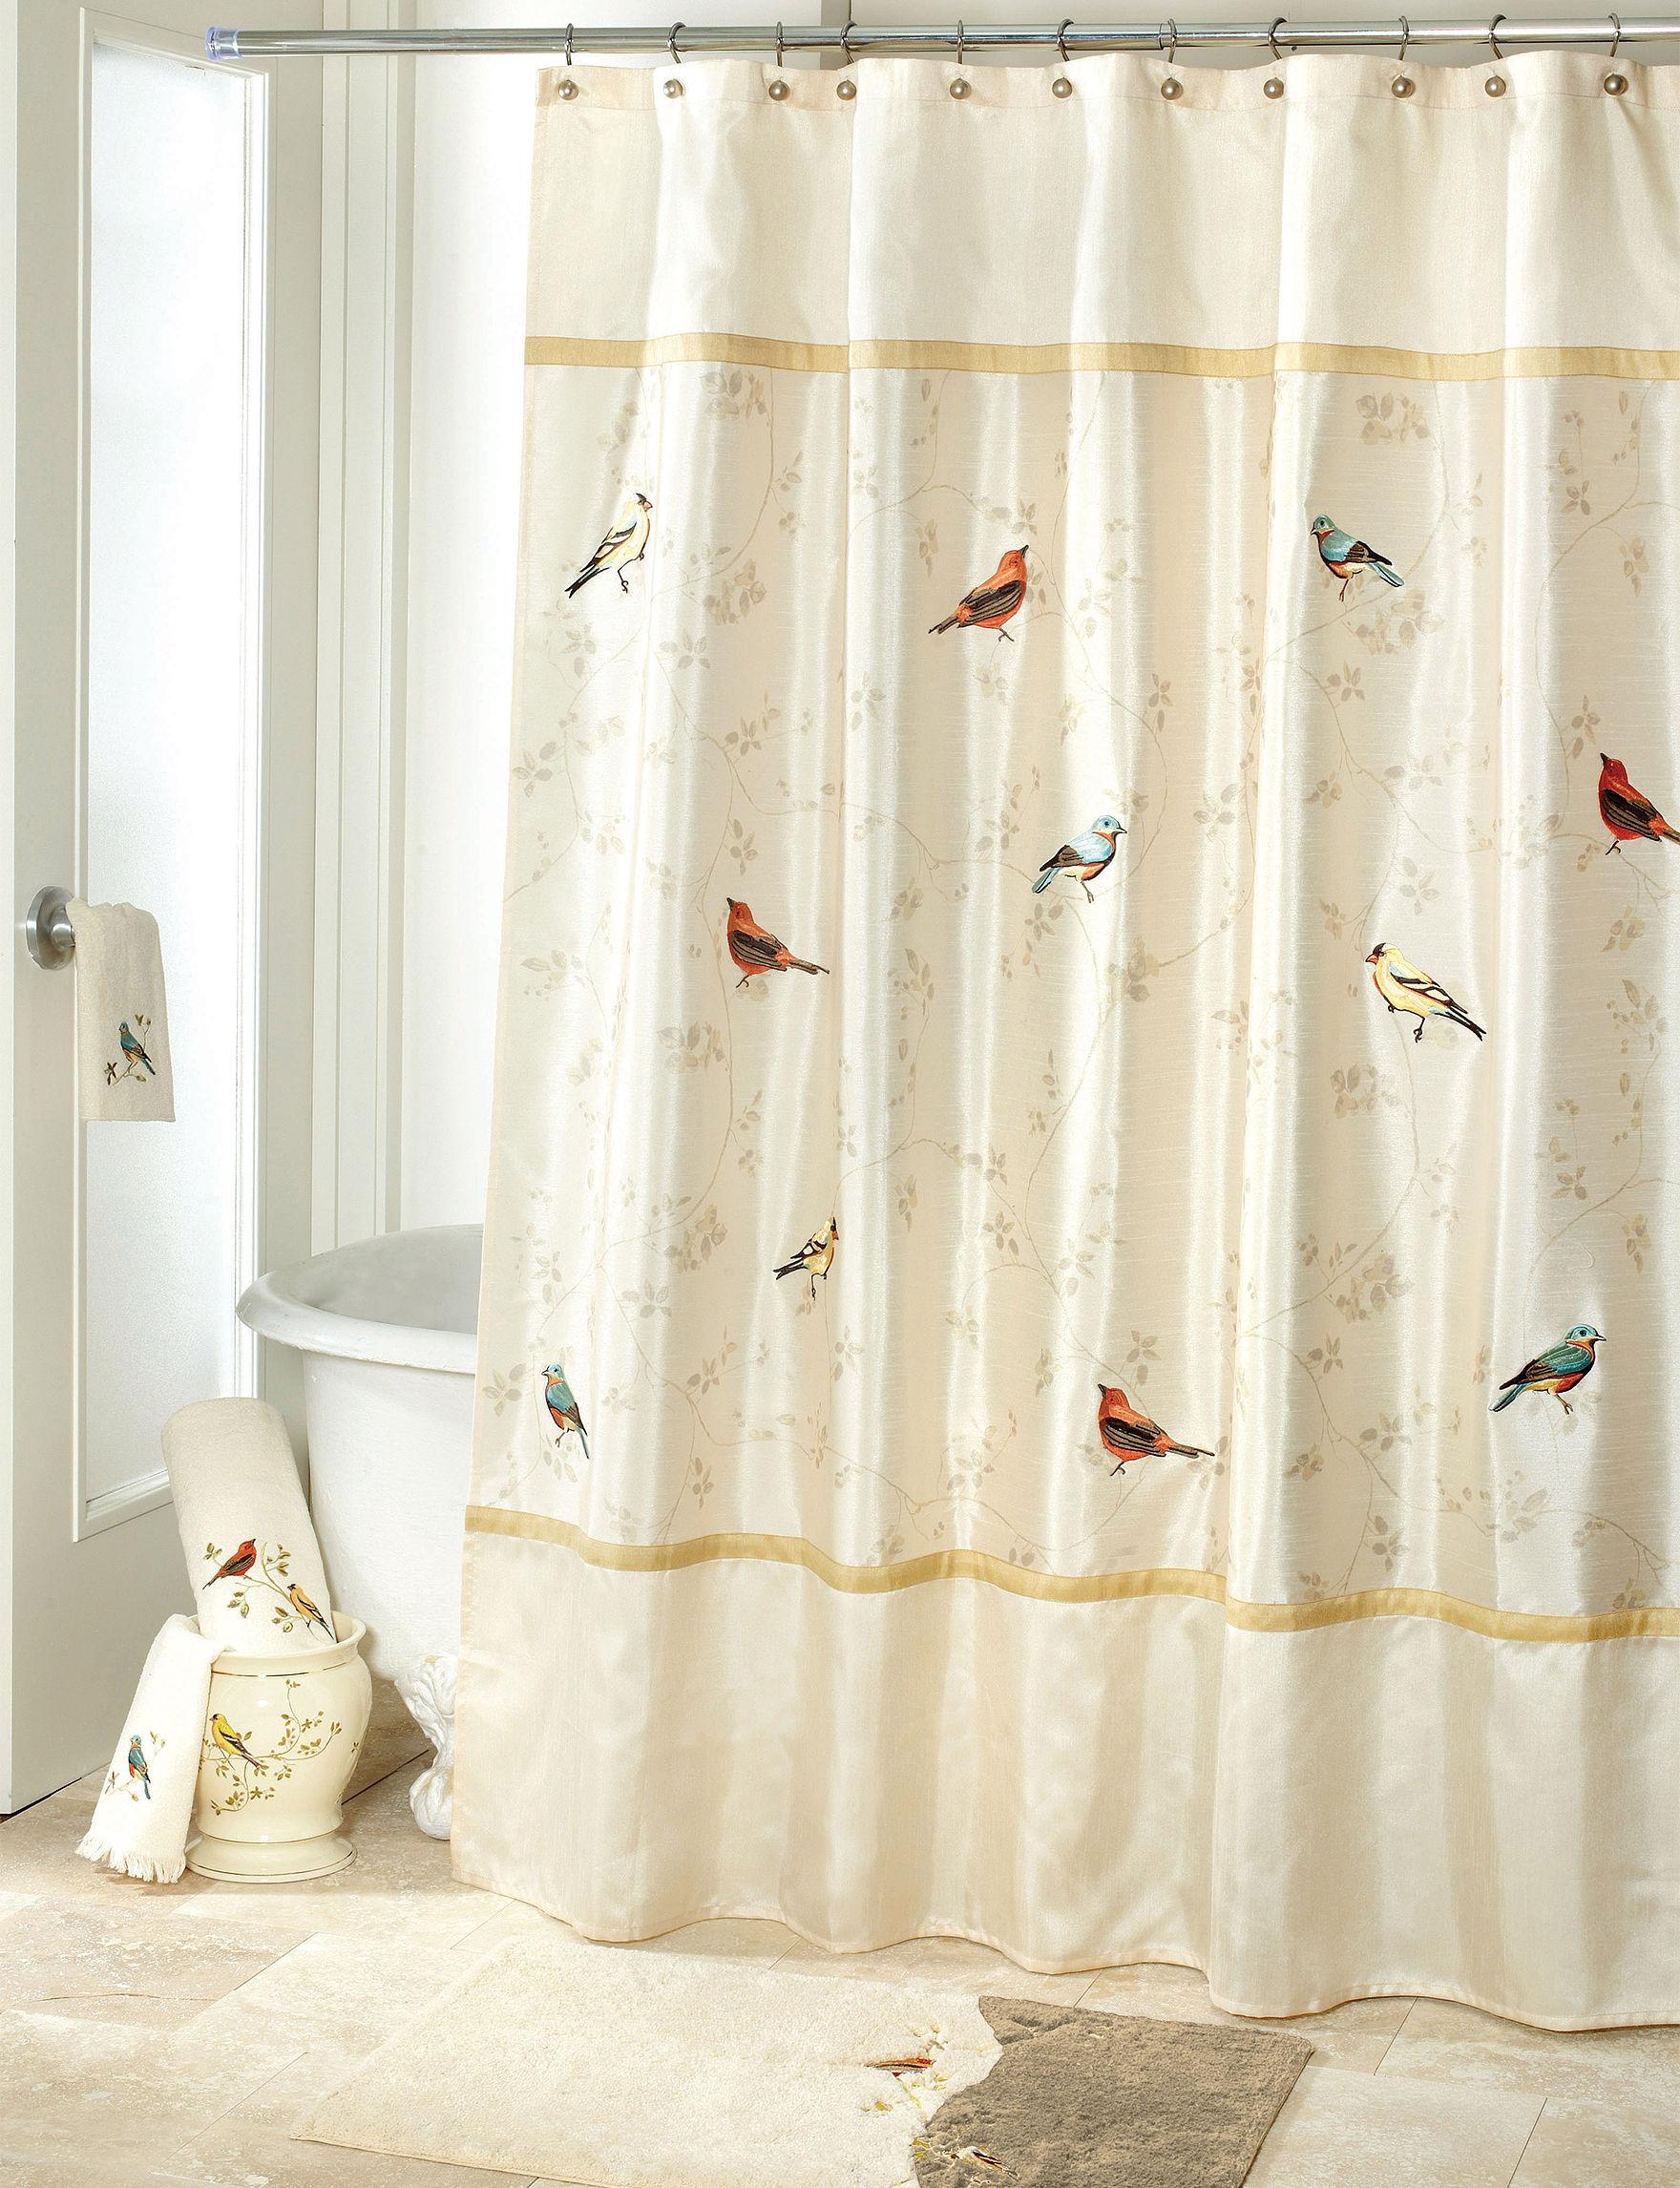 Pebble Beach Polo >> Avanti Gilded Birds Bath Collection Shower Curtain | Stage Stores